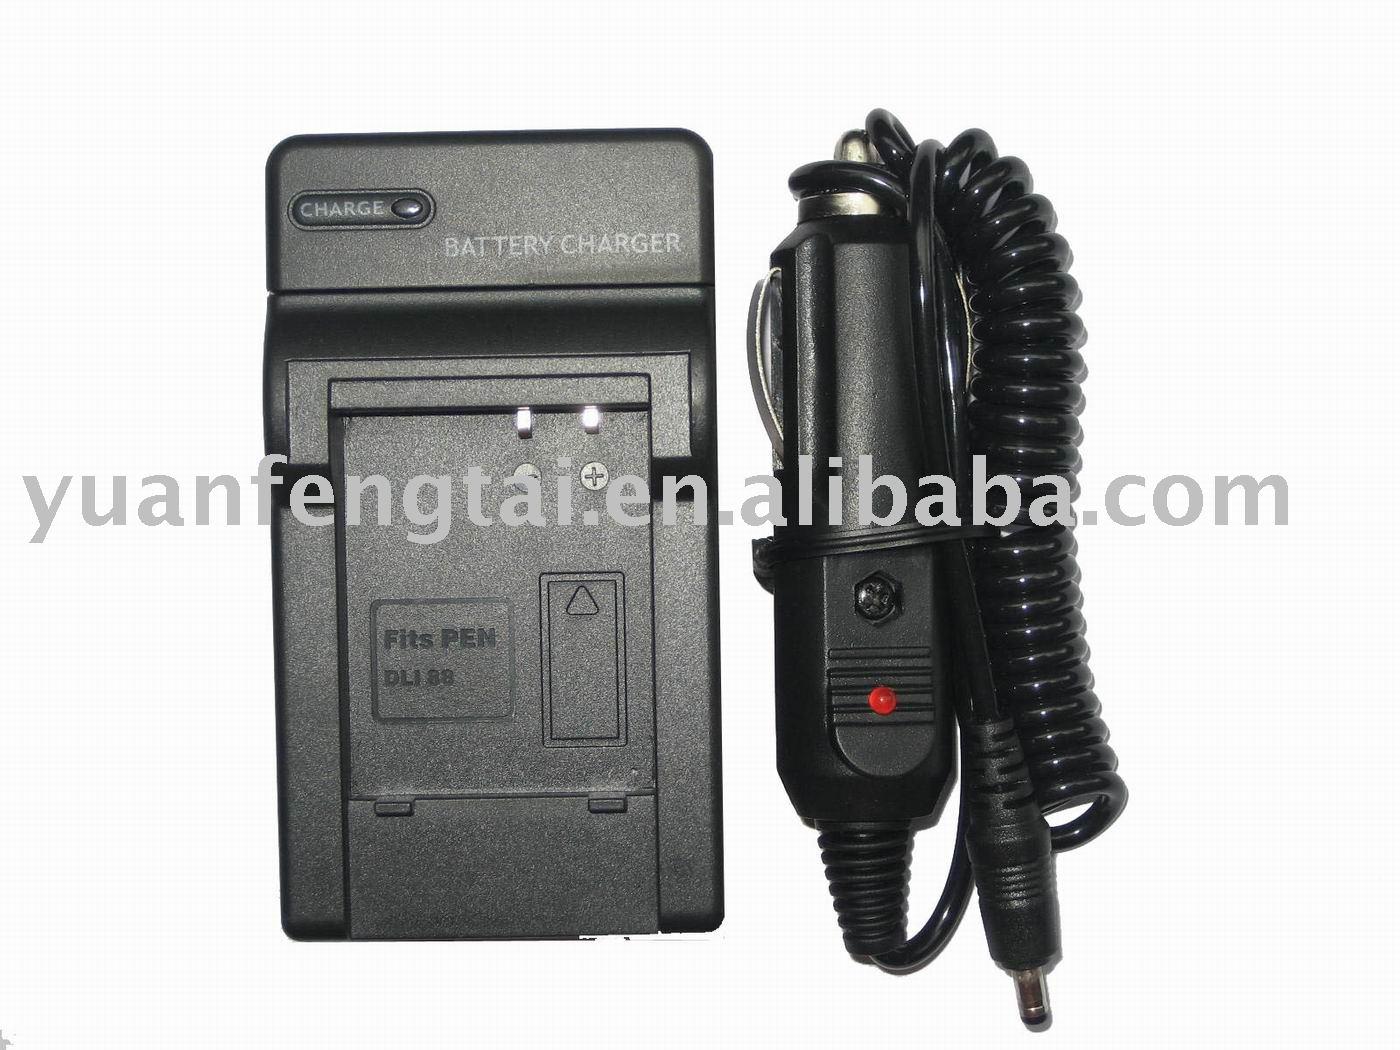 D-Li88 Camera Charger Digital Camera Battery Charger for Pentax D-Li88